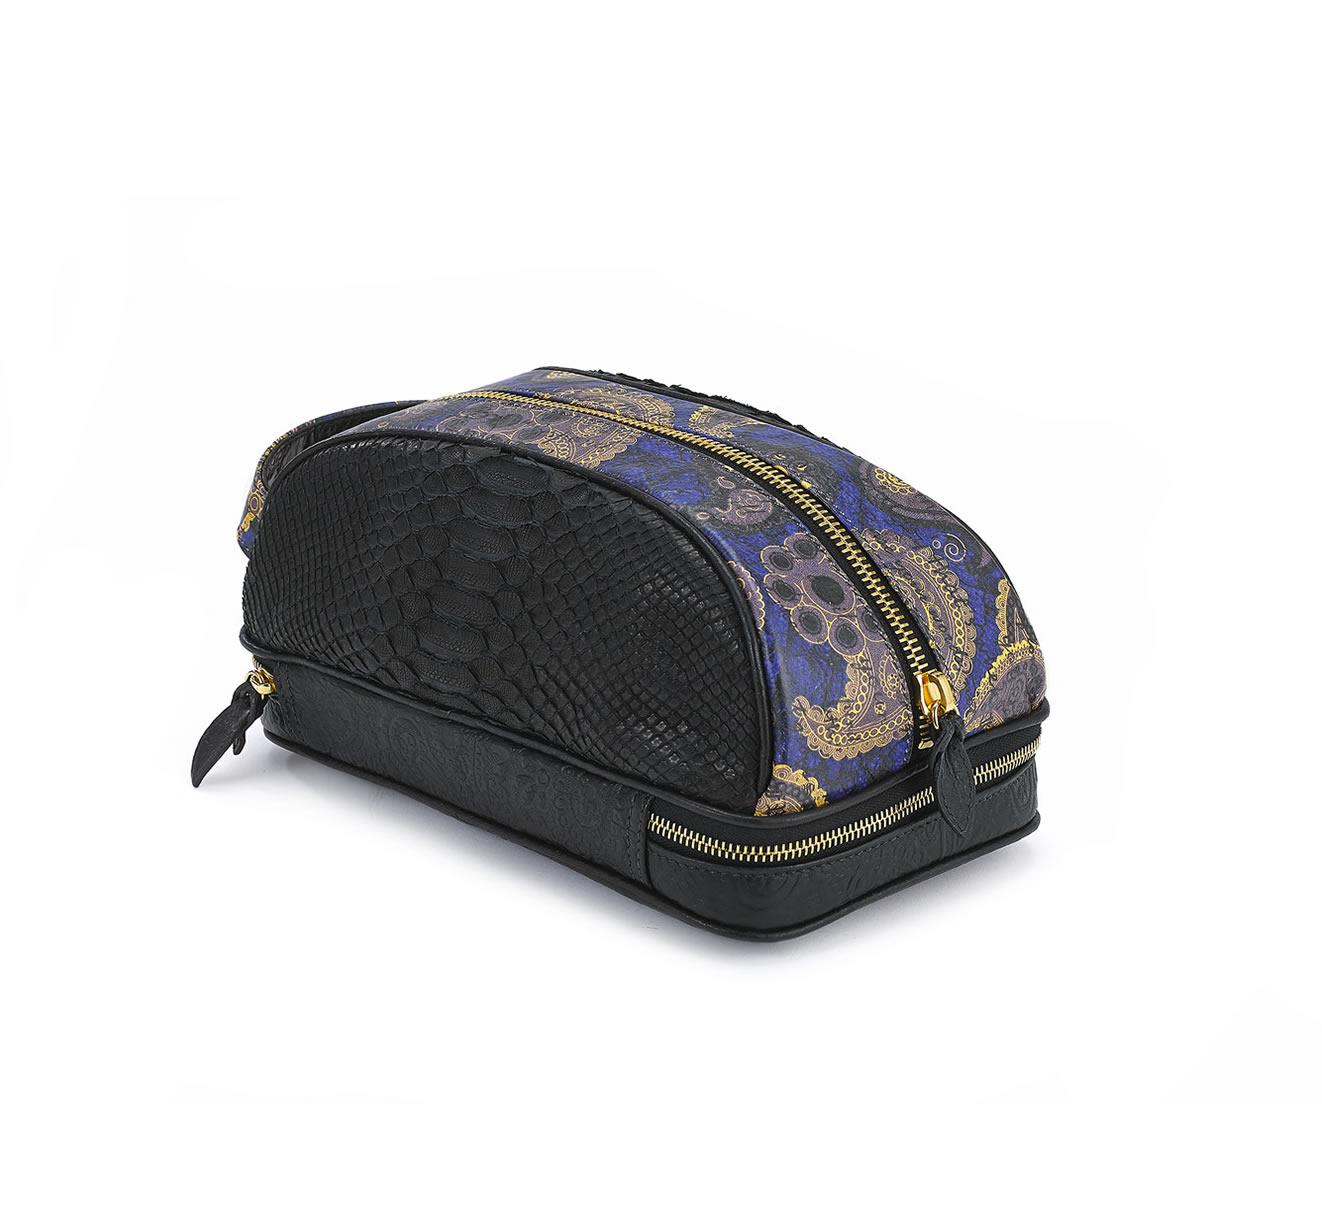 DOPP KIT BLK PYTHON BLUE GOLD PAISLEY bag